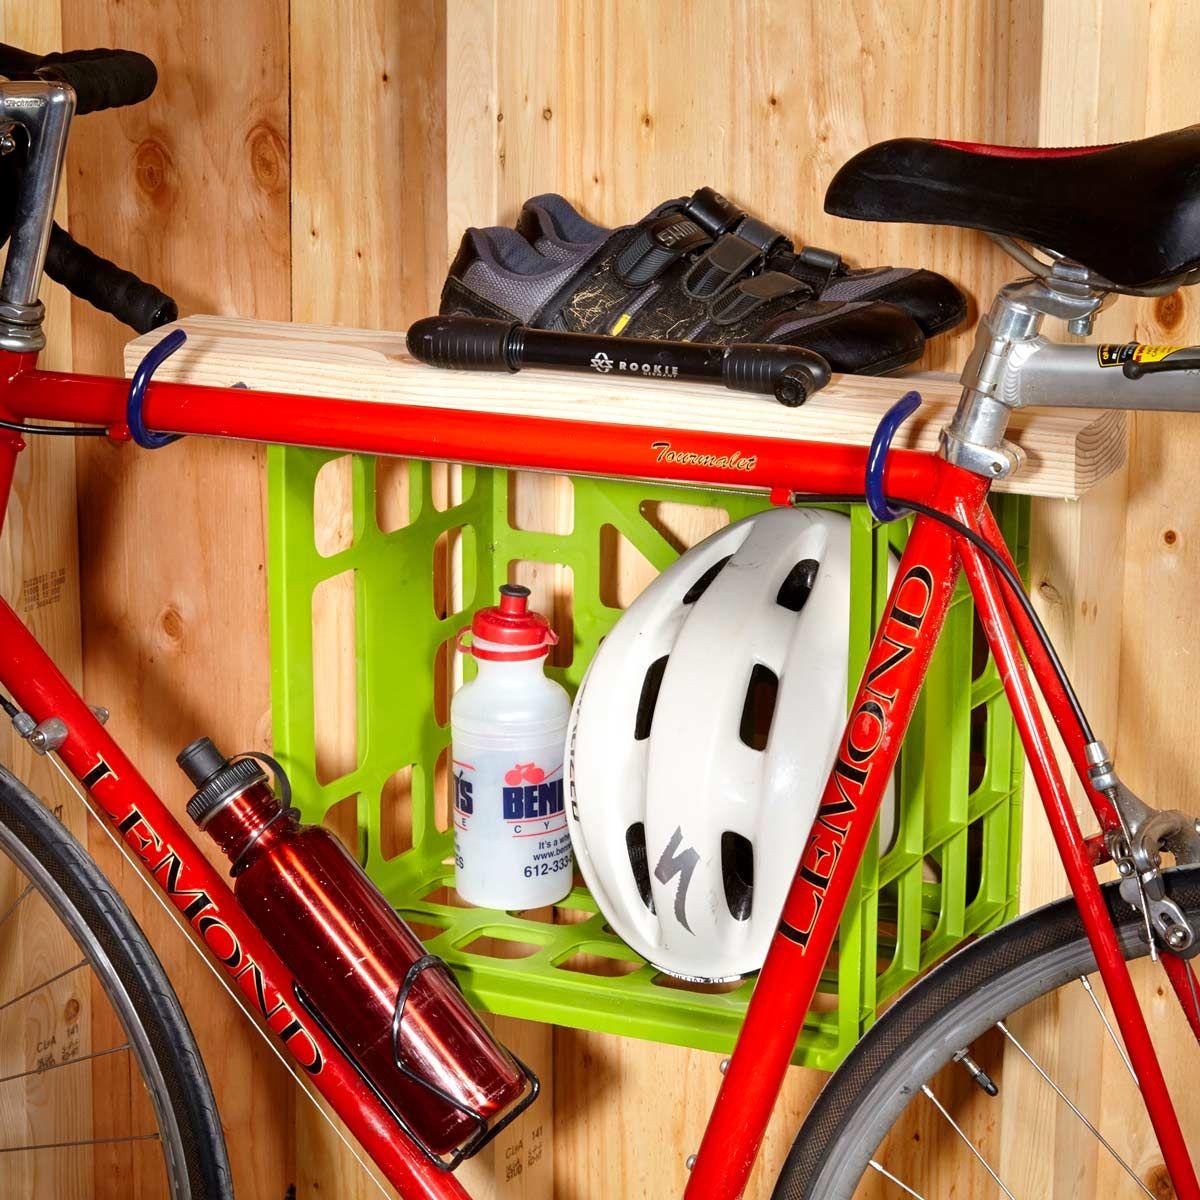 Storage Hack For Bike Gear Bike Storage Design Bike Storage